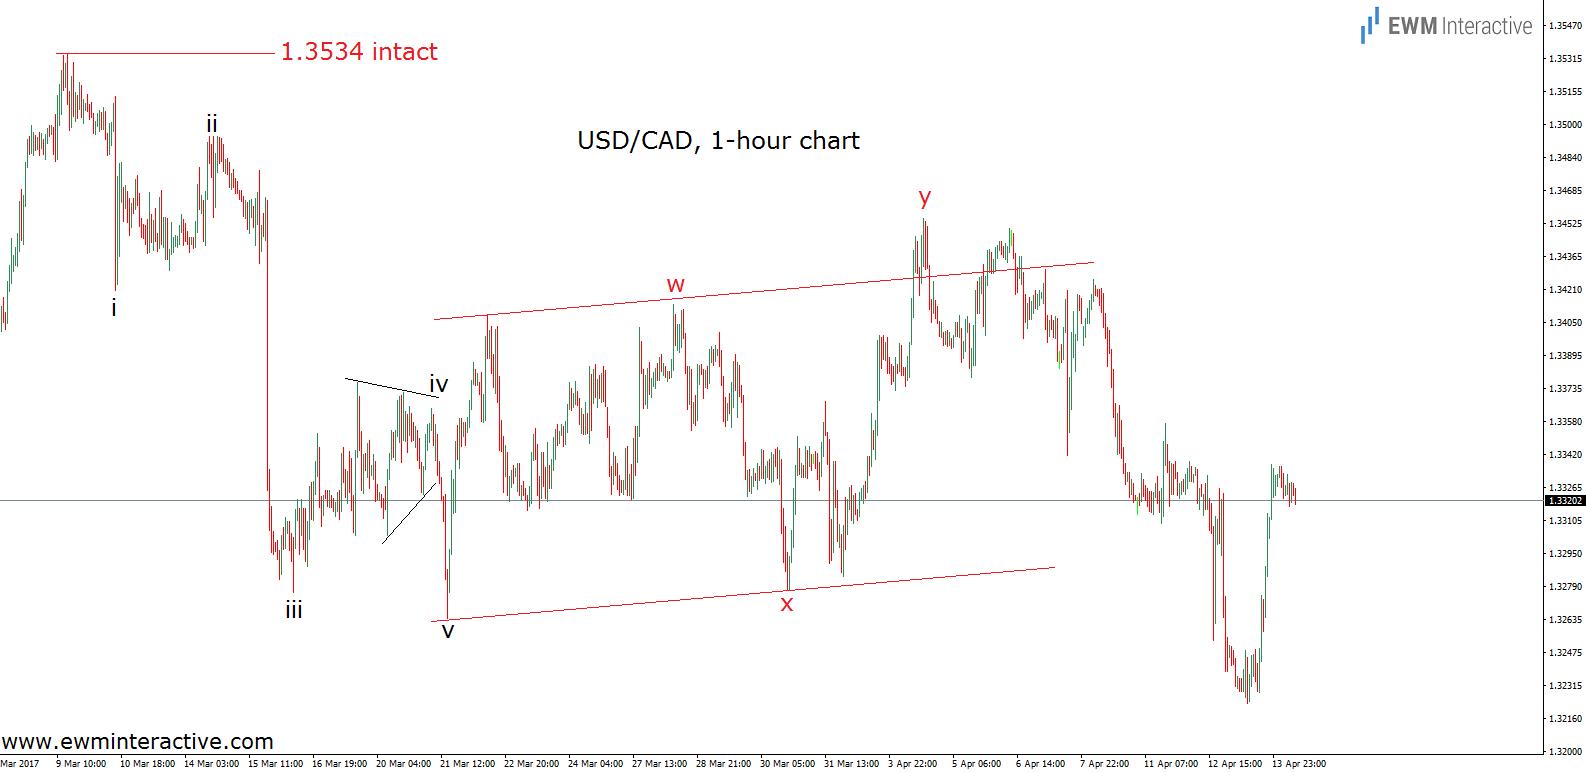 usdcad elliott wave chart updated